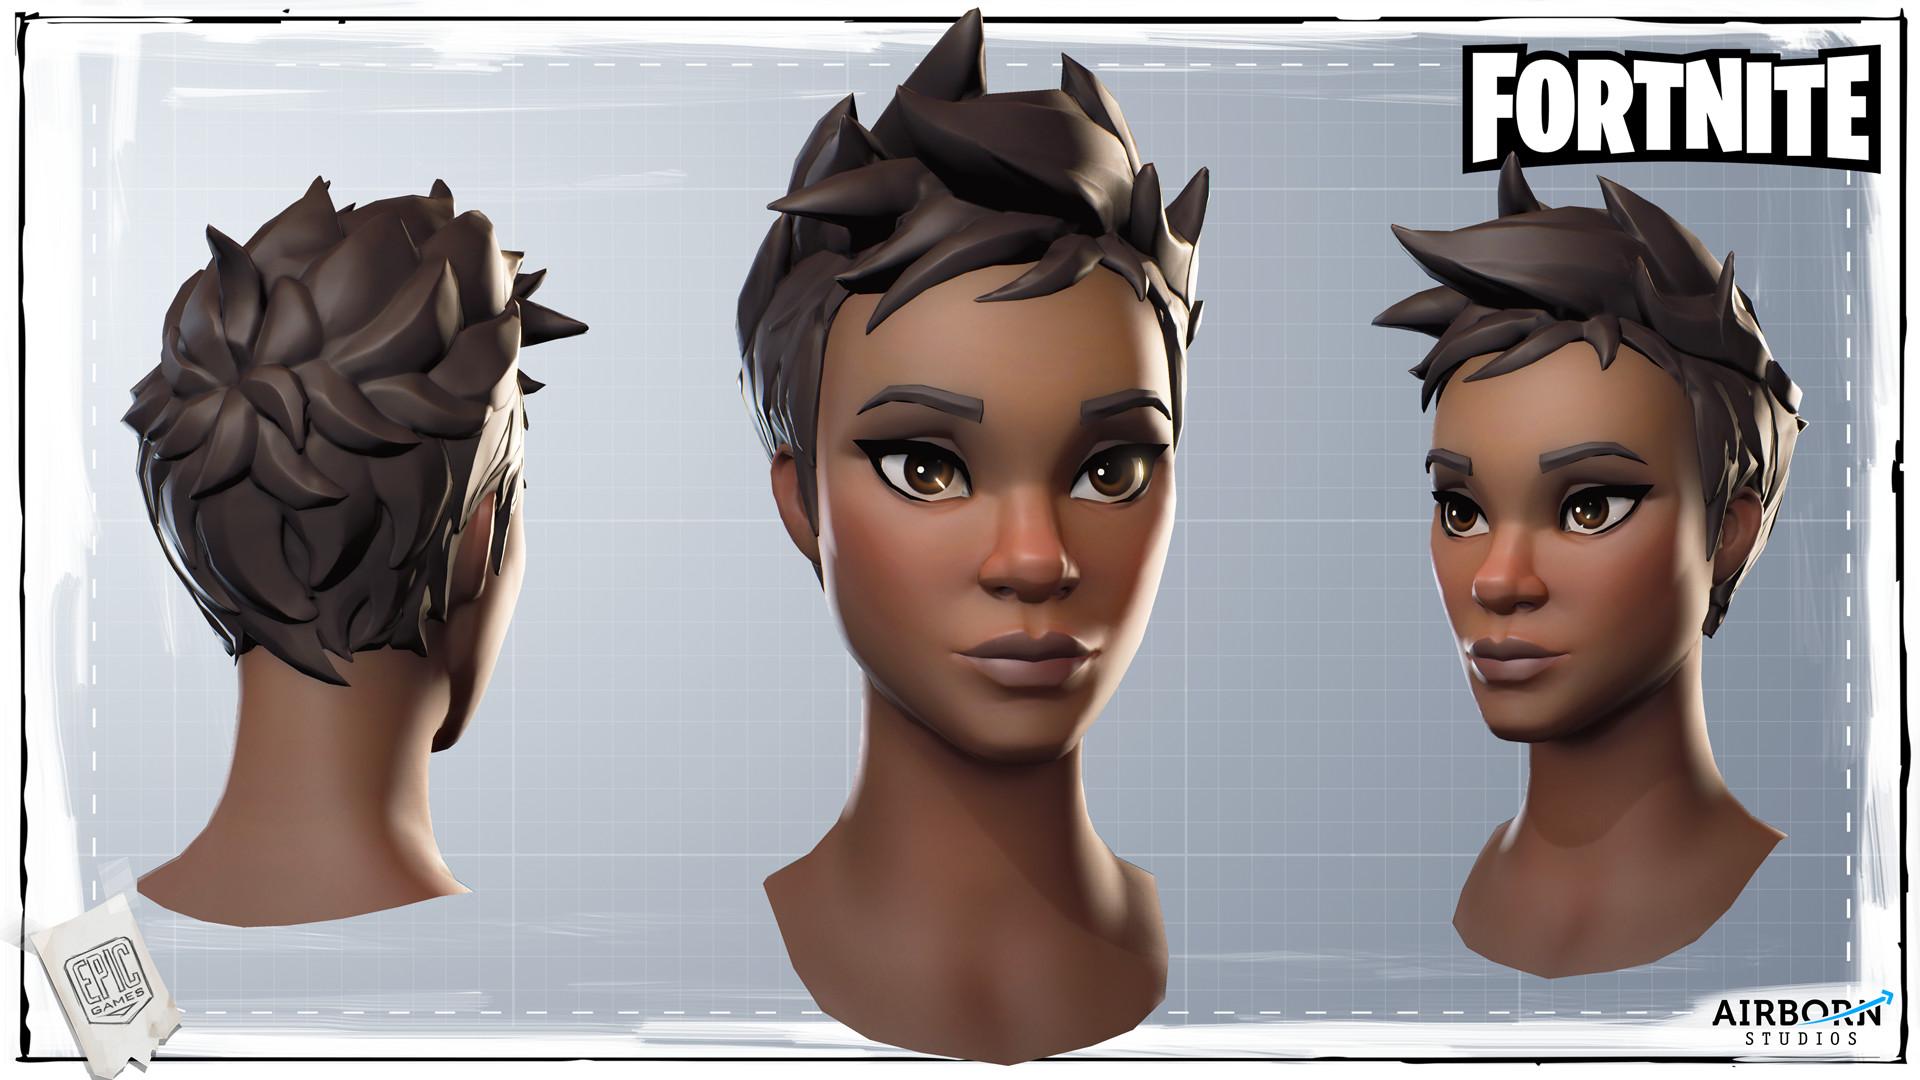 Airborn Studios - Fortnite Character Head Batch 04-4690